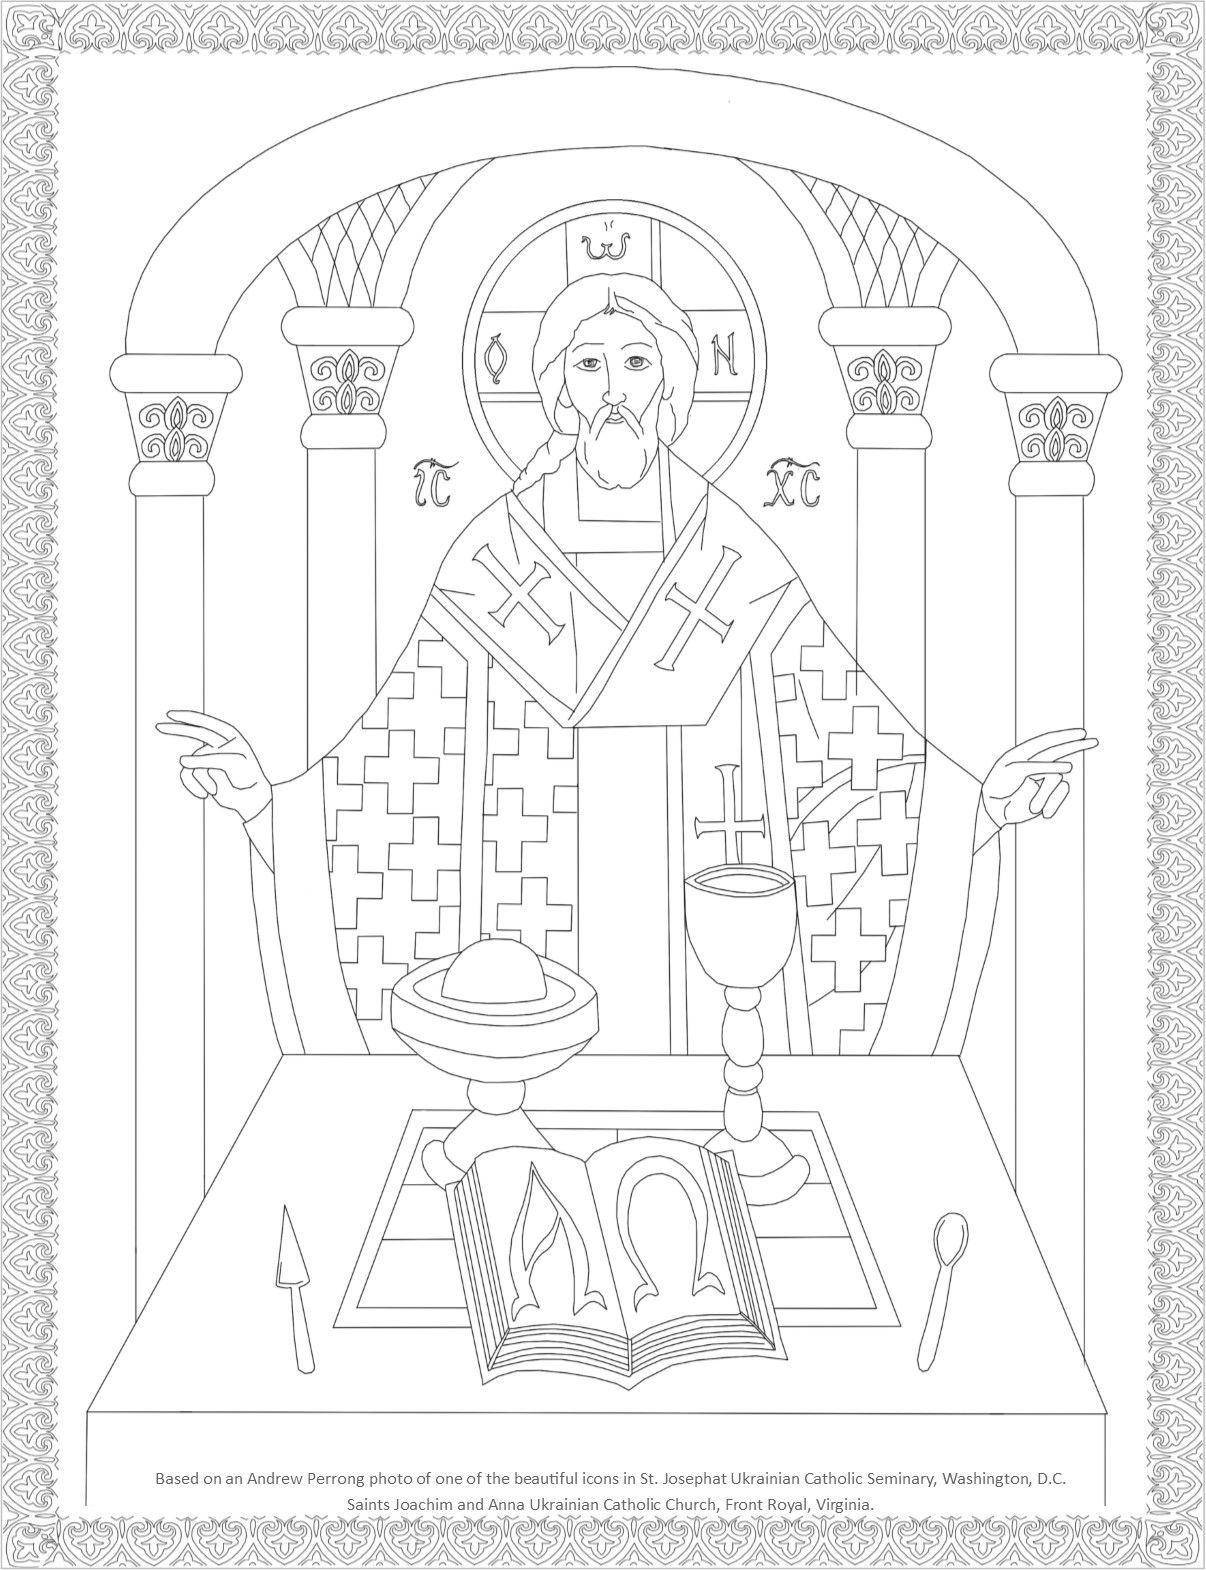 byzantine icon coloring page, the holy eucharist | catholic ... - Coloring Pages Catholic Sacraments